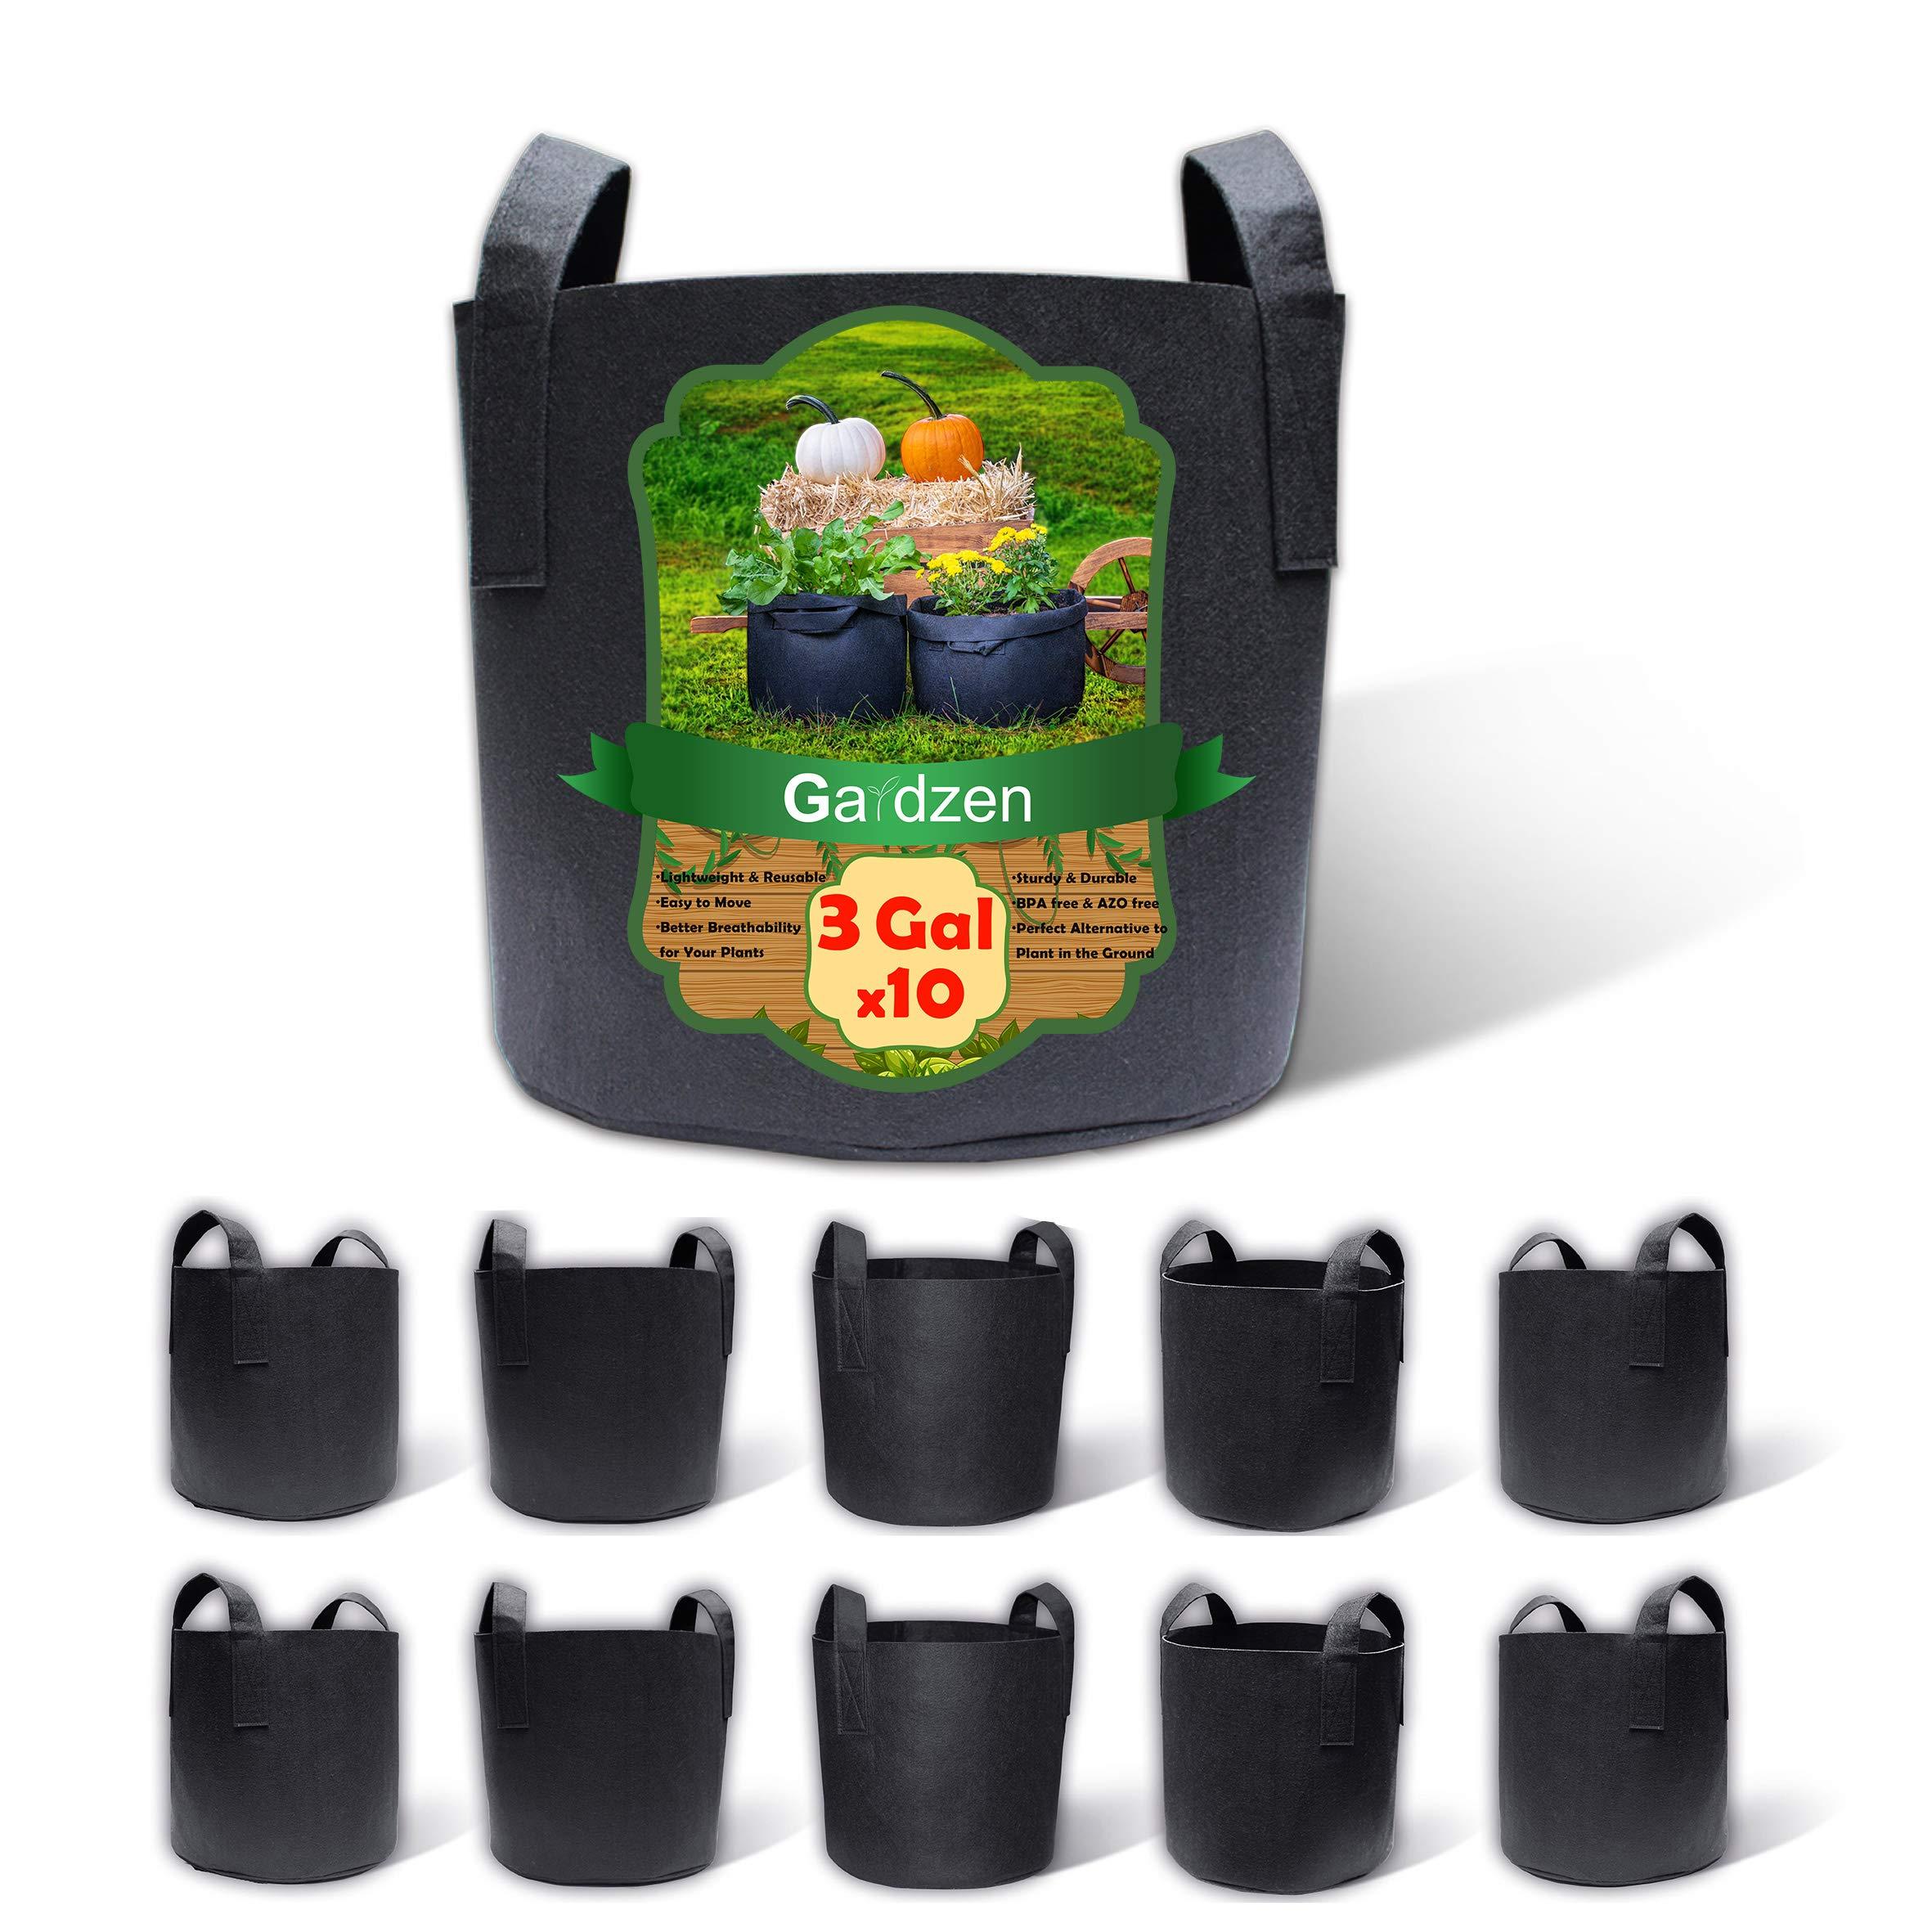 Gardzen 10-Pack 3 Gallons Grow Bags, Aeration Fabric Pots with Handles